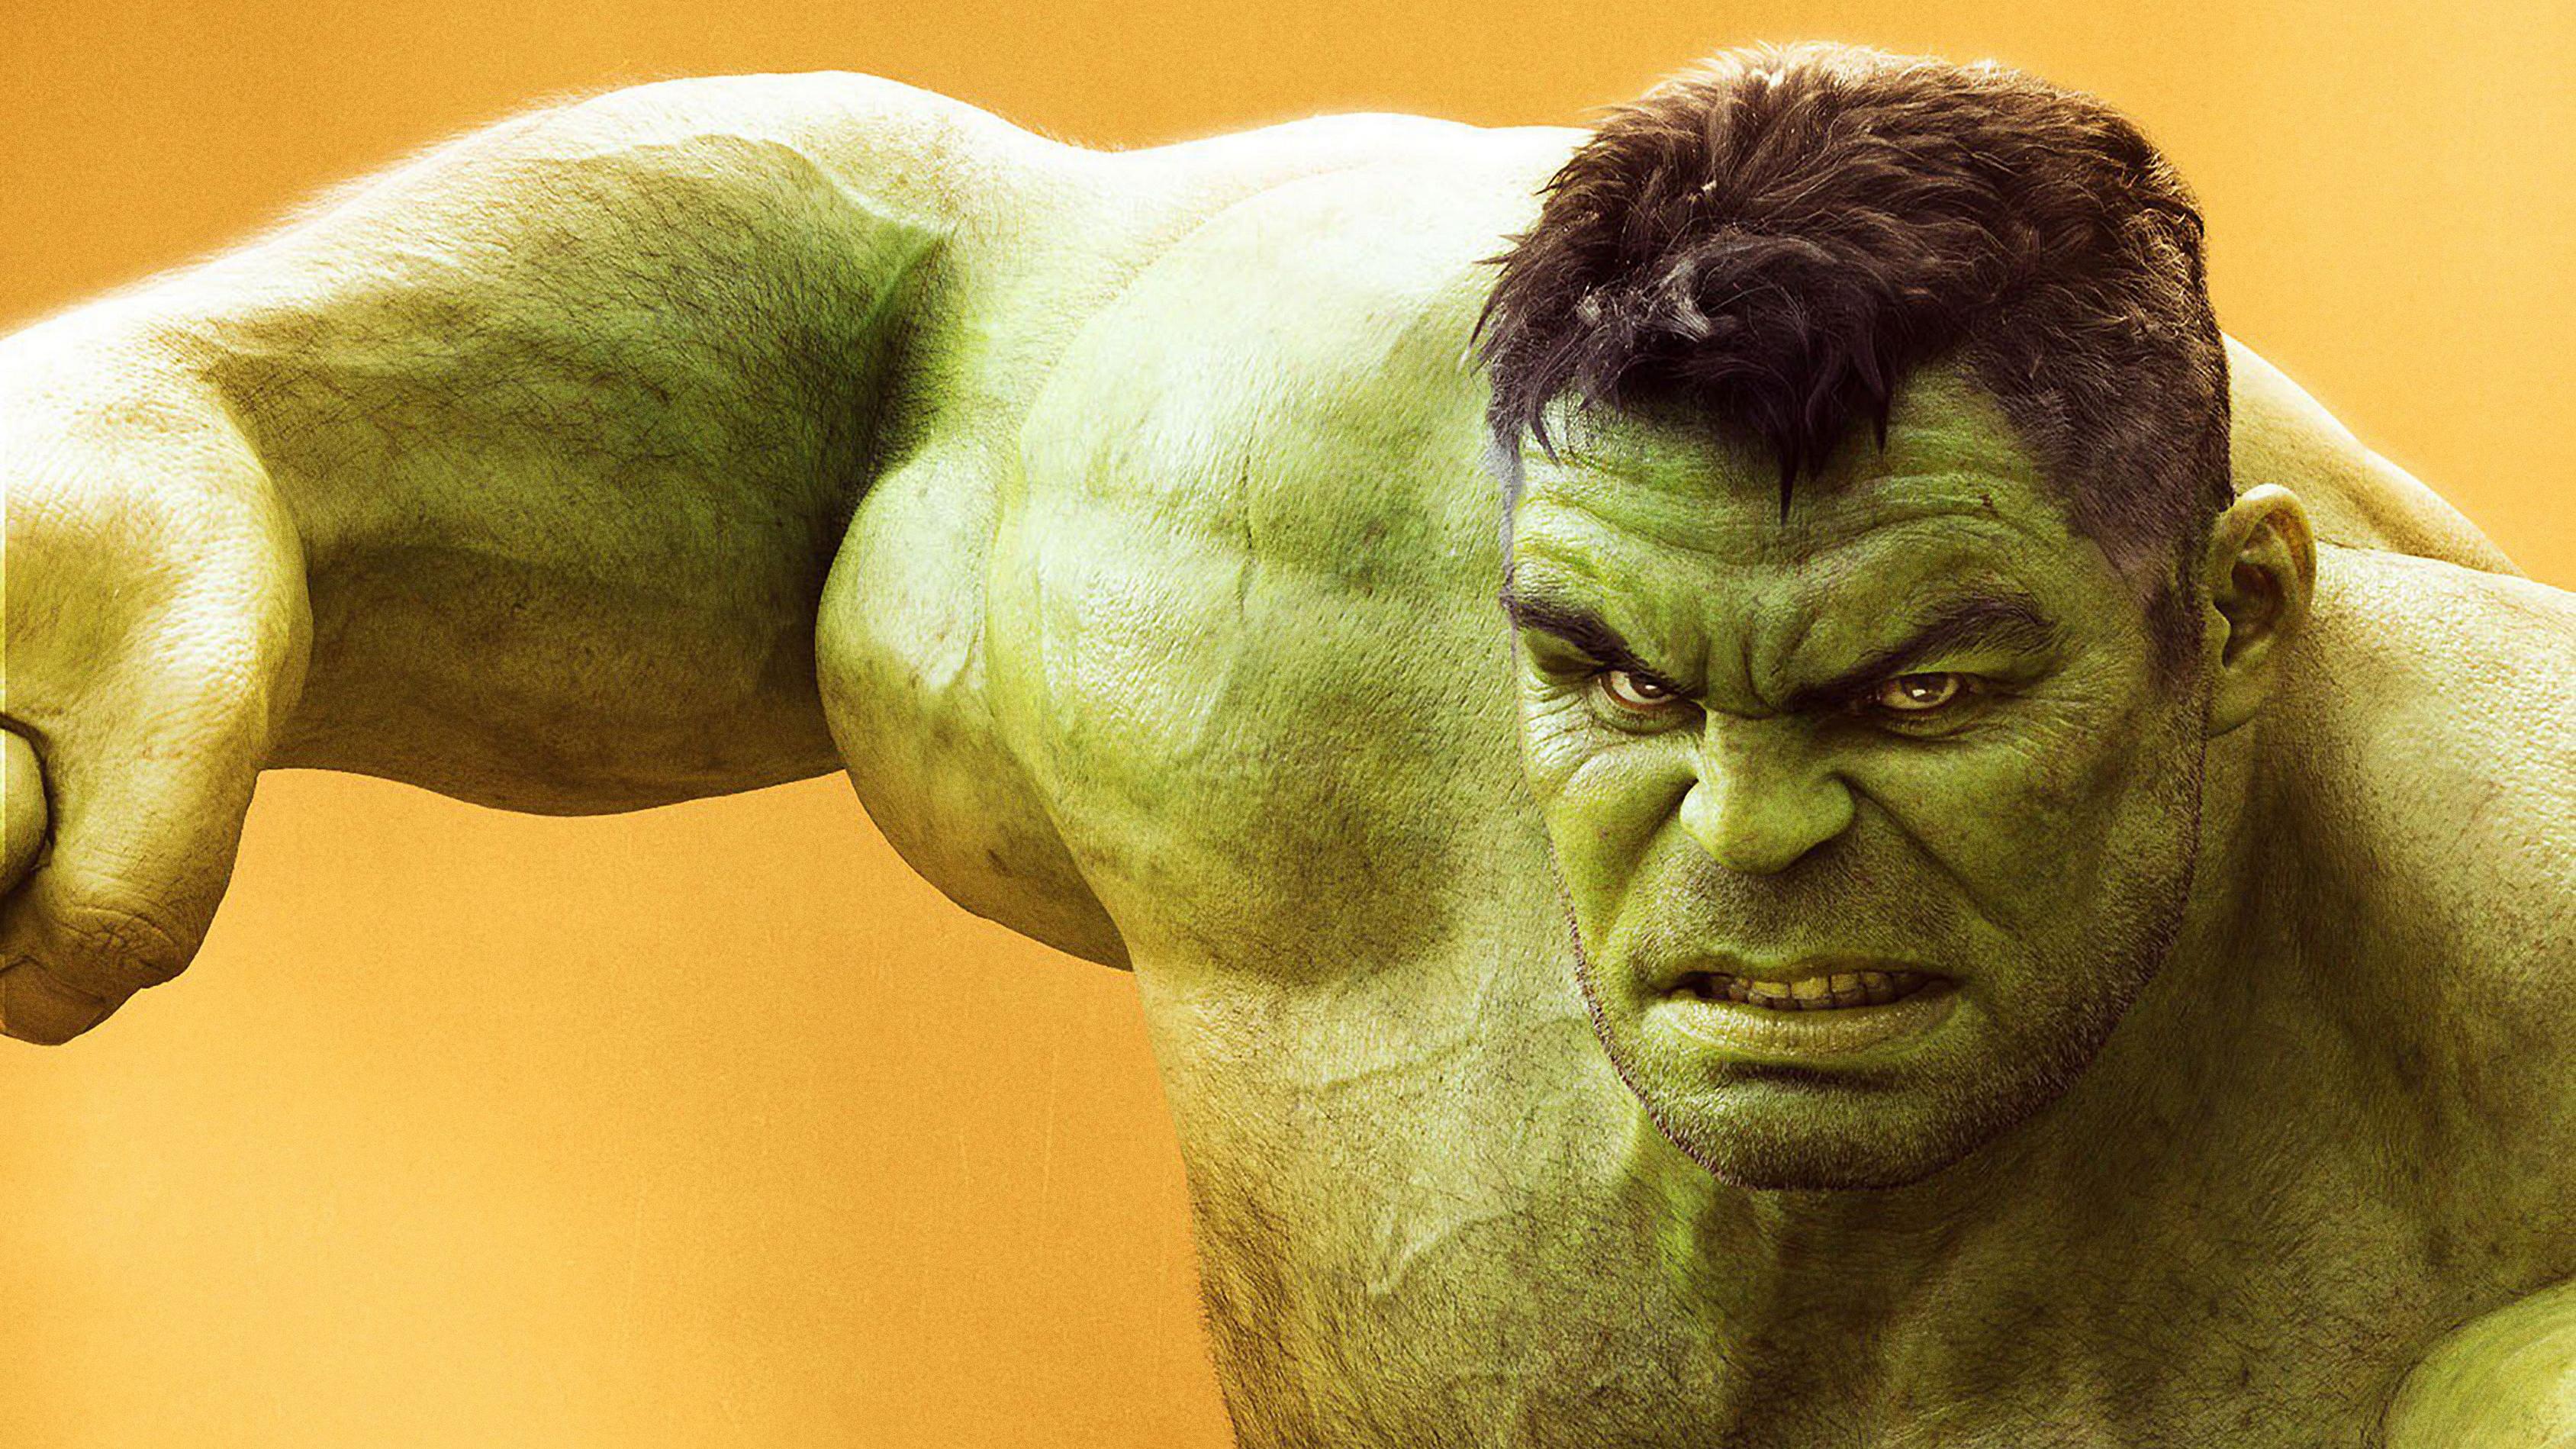 1080x1920 Hulk Superhero Iphone 7,6s,6 Plus, Pixel Xl ,One